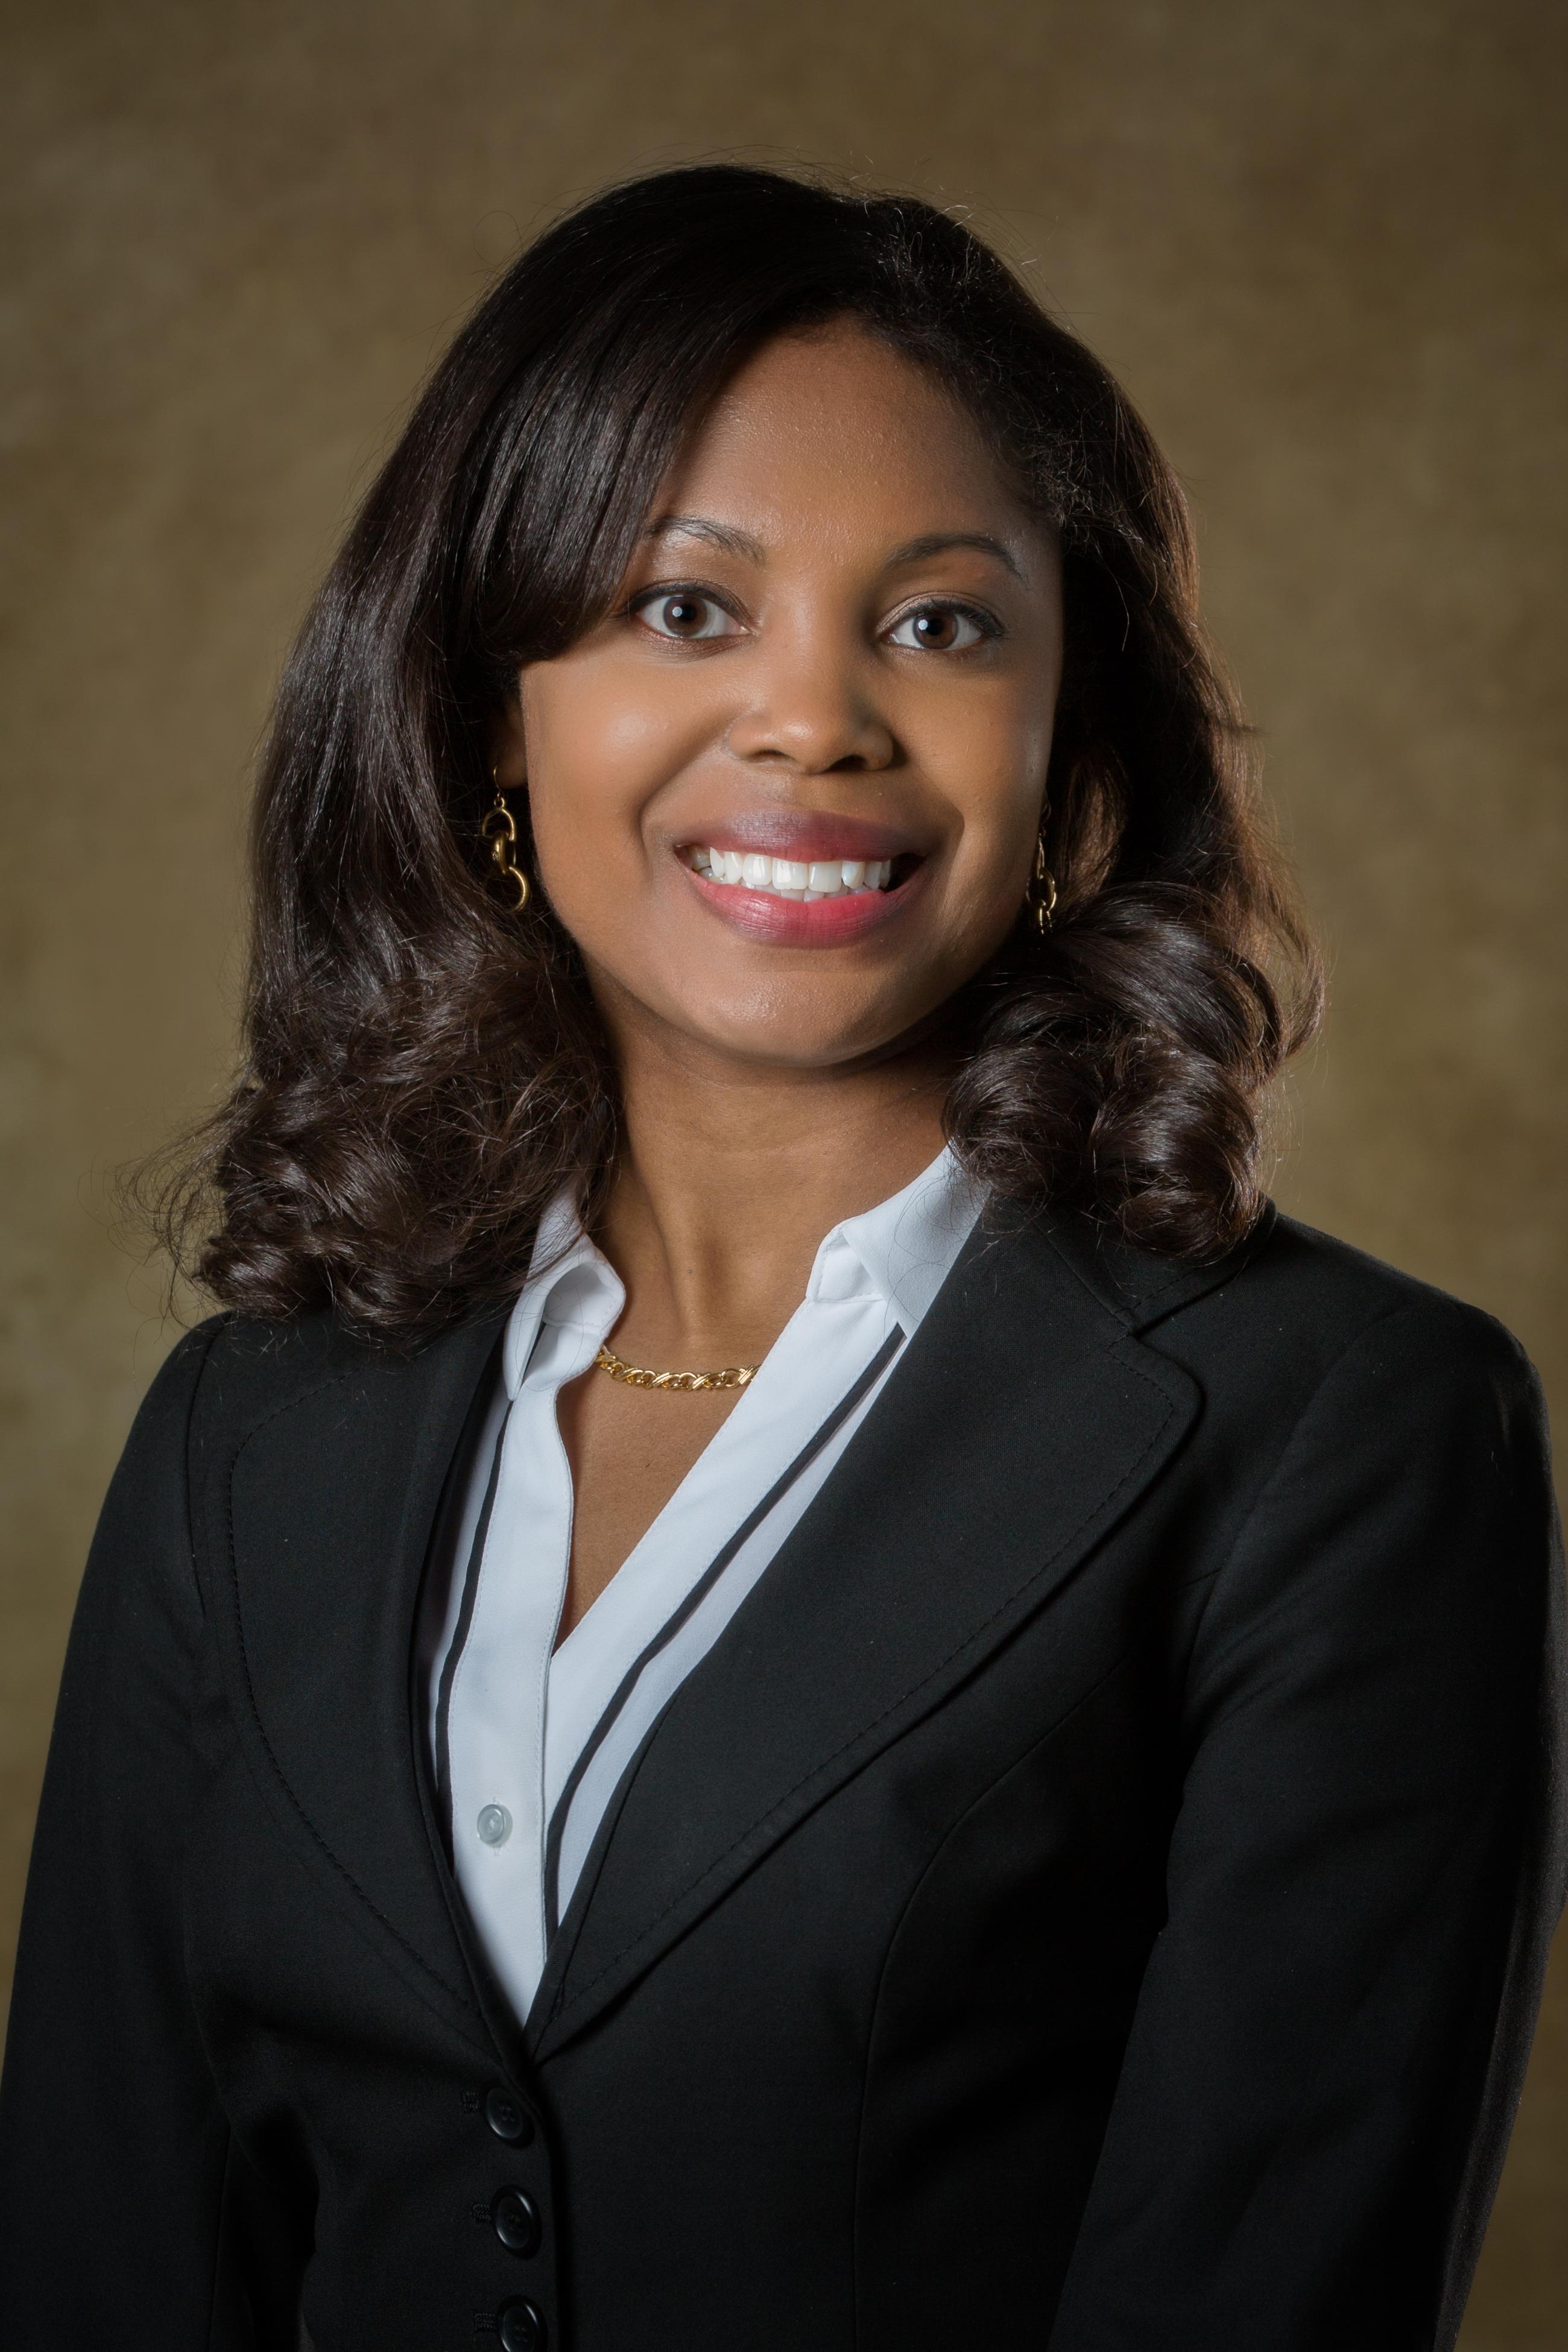 Dr. Jennifer Perry